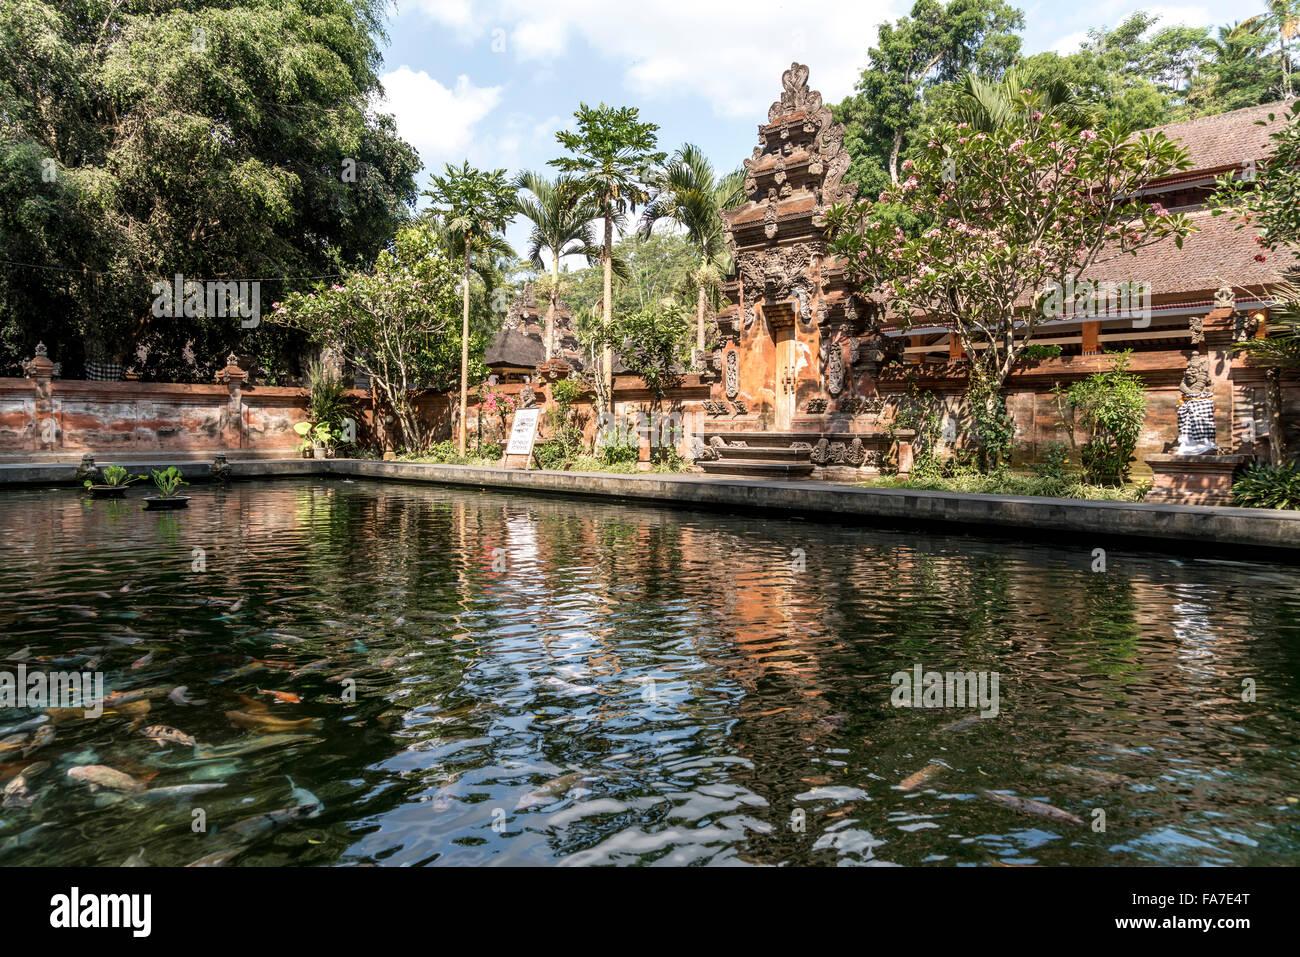 fish pond at the Hindu water temple Tirta Empul near Ubud, Bali, Indonesia - Stock Image